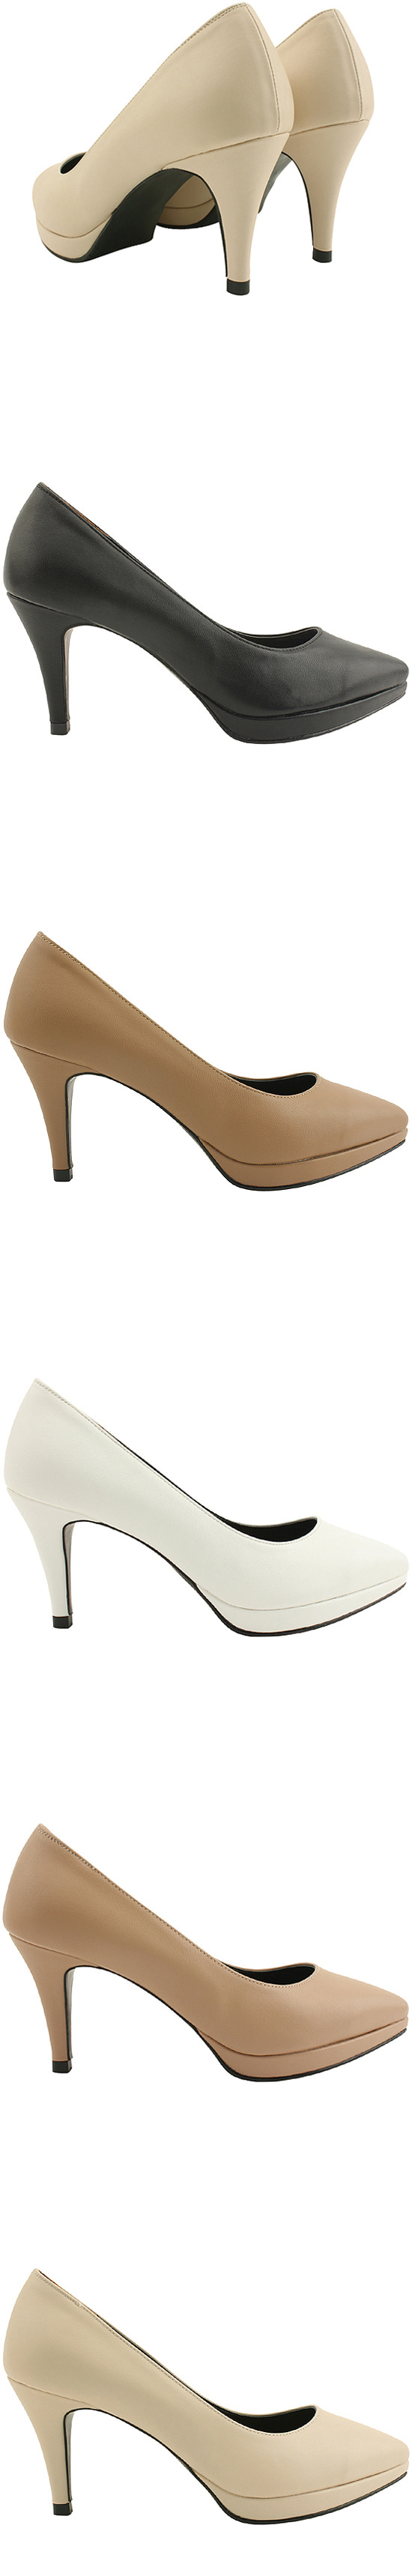 Stiletto heels black